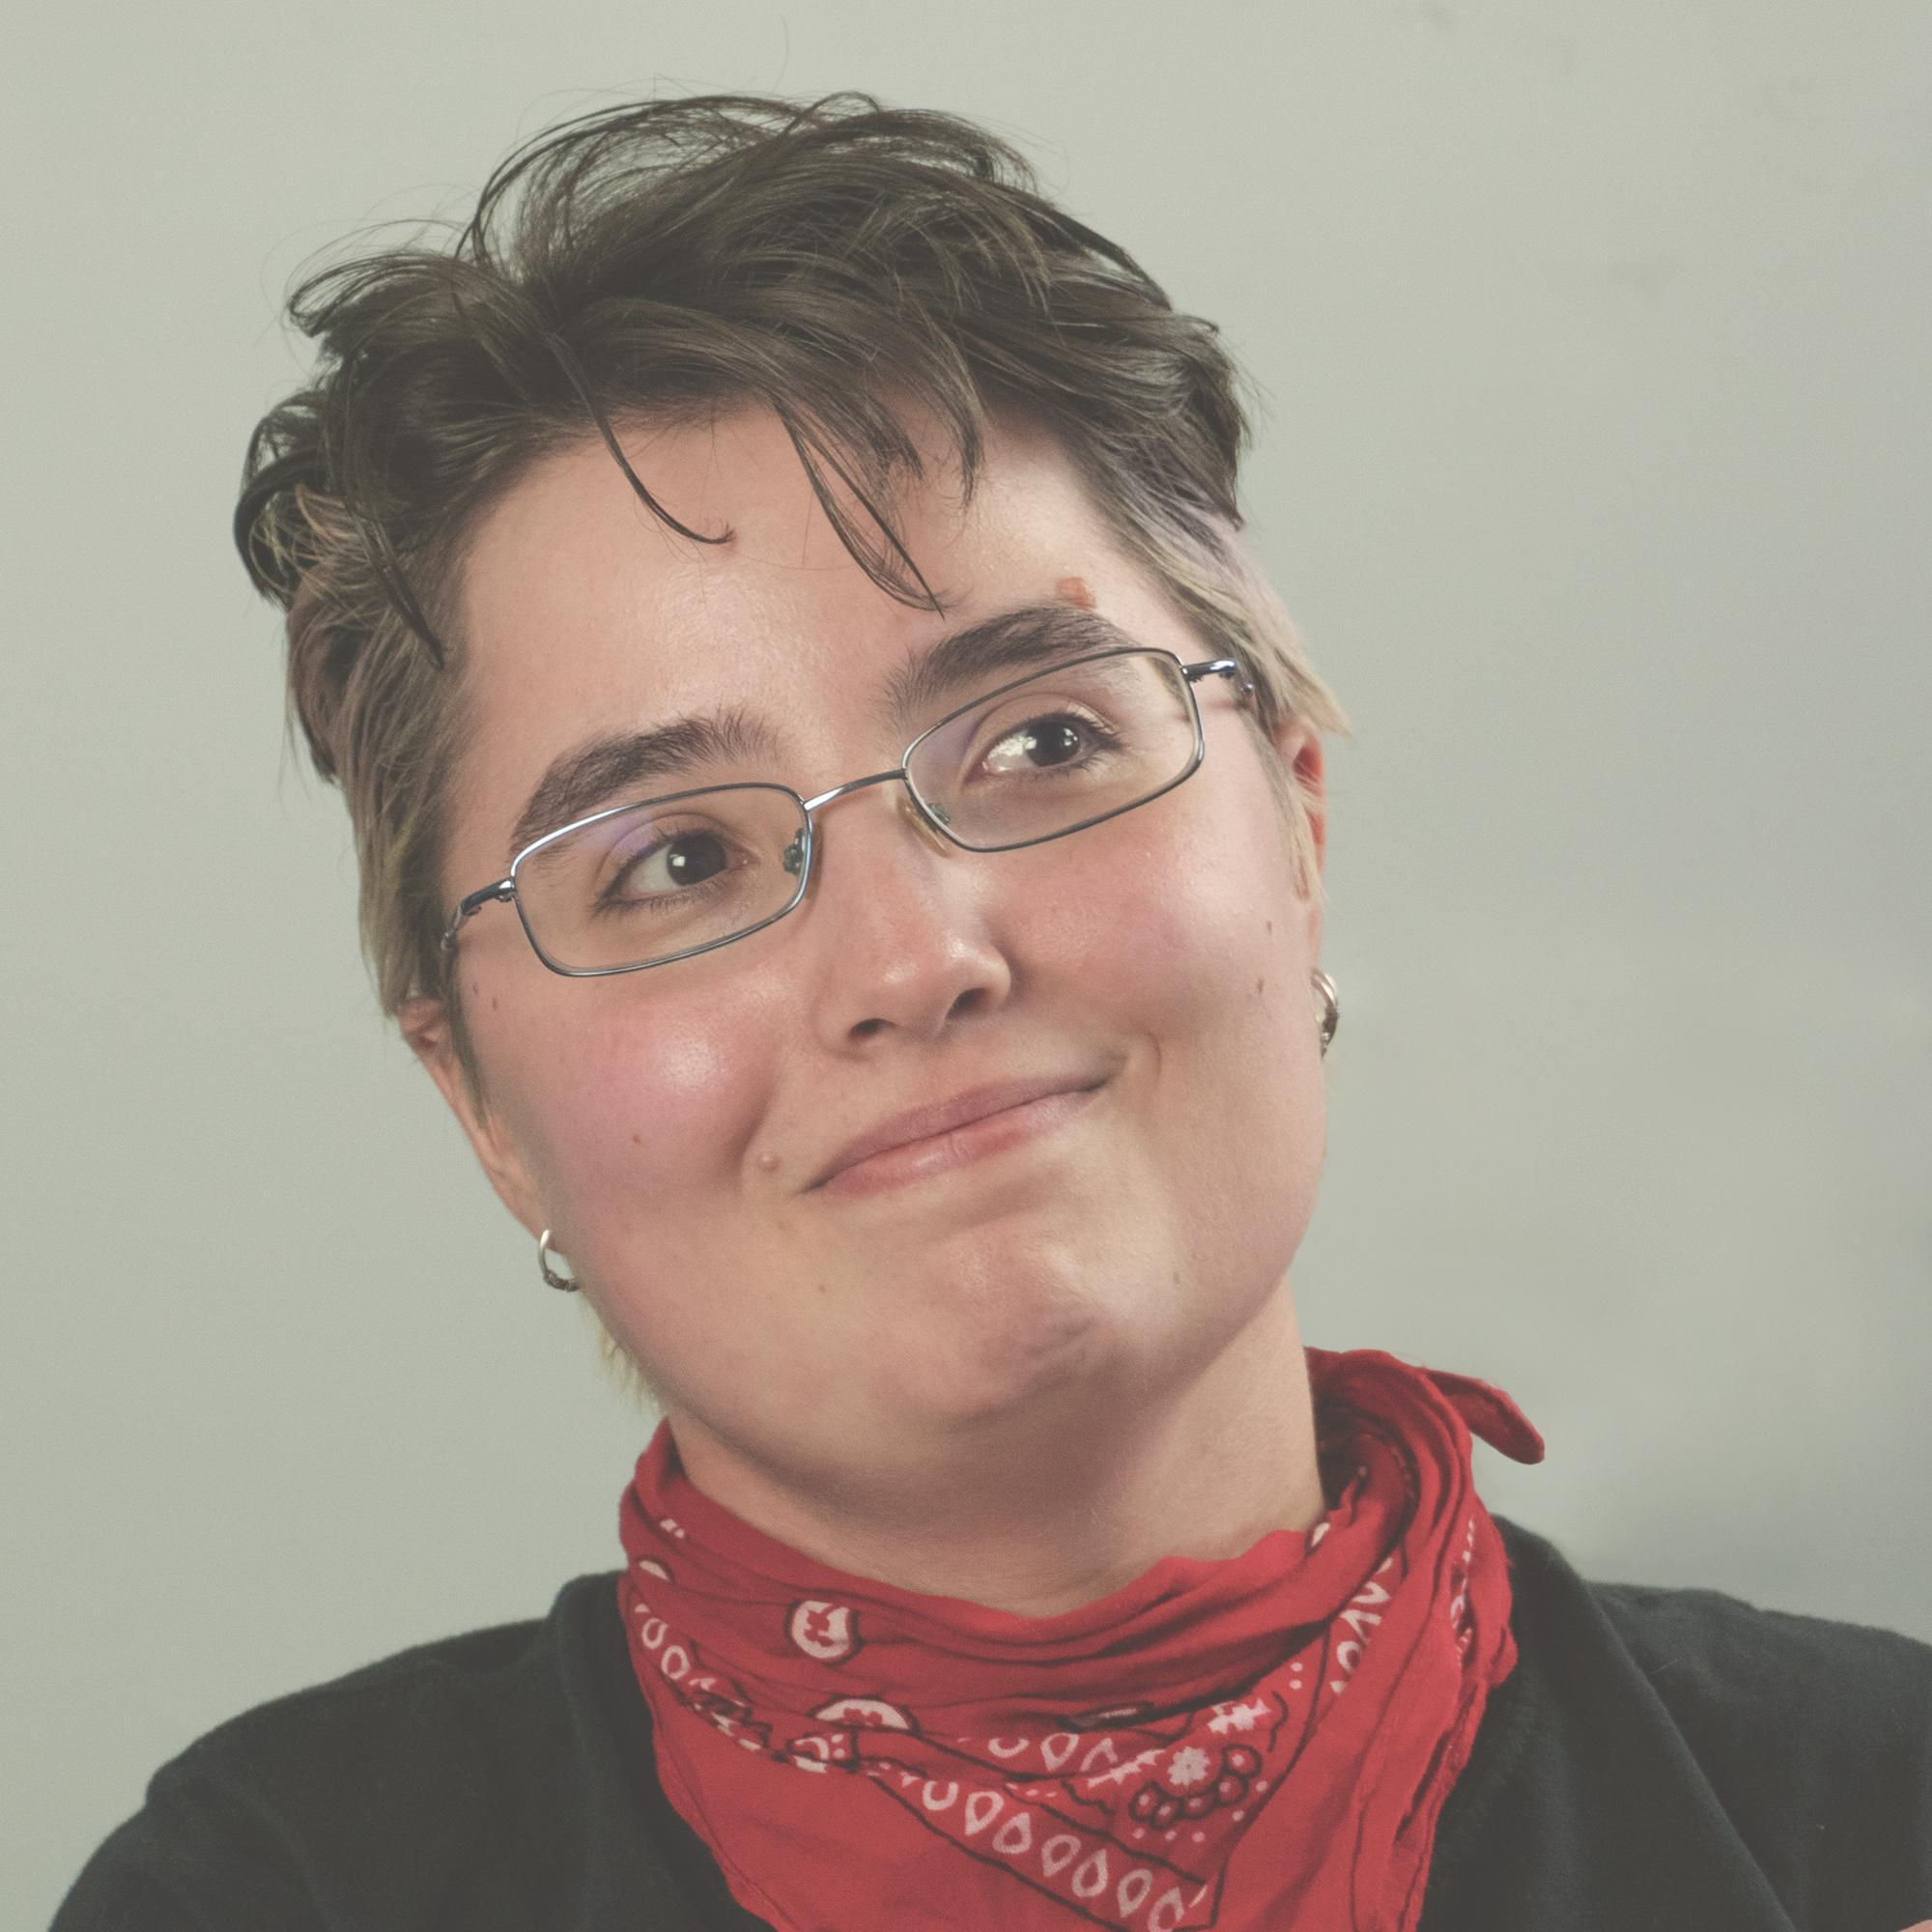 Irene Caravaca